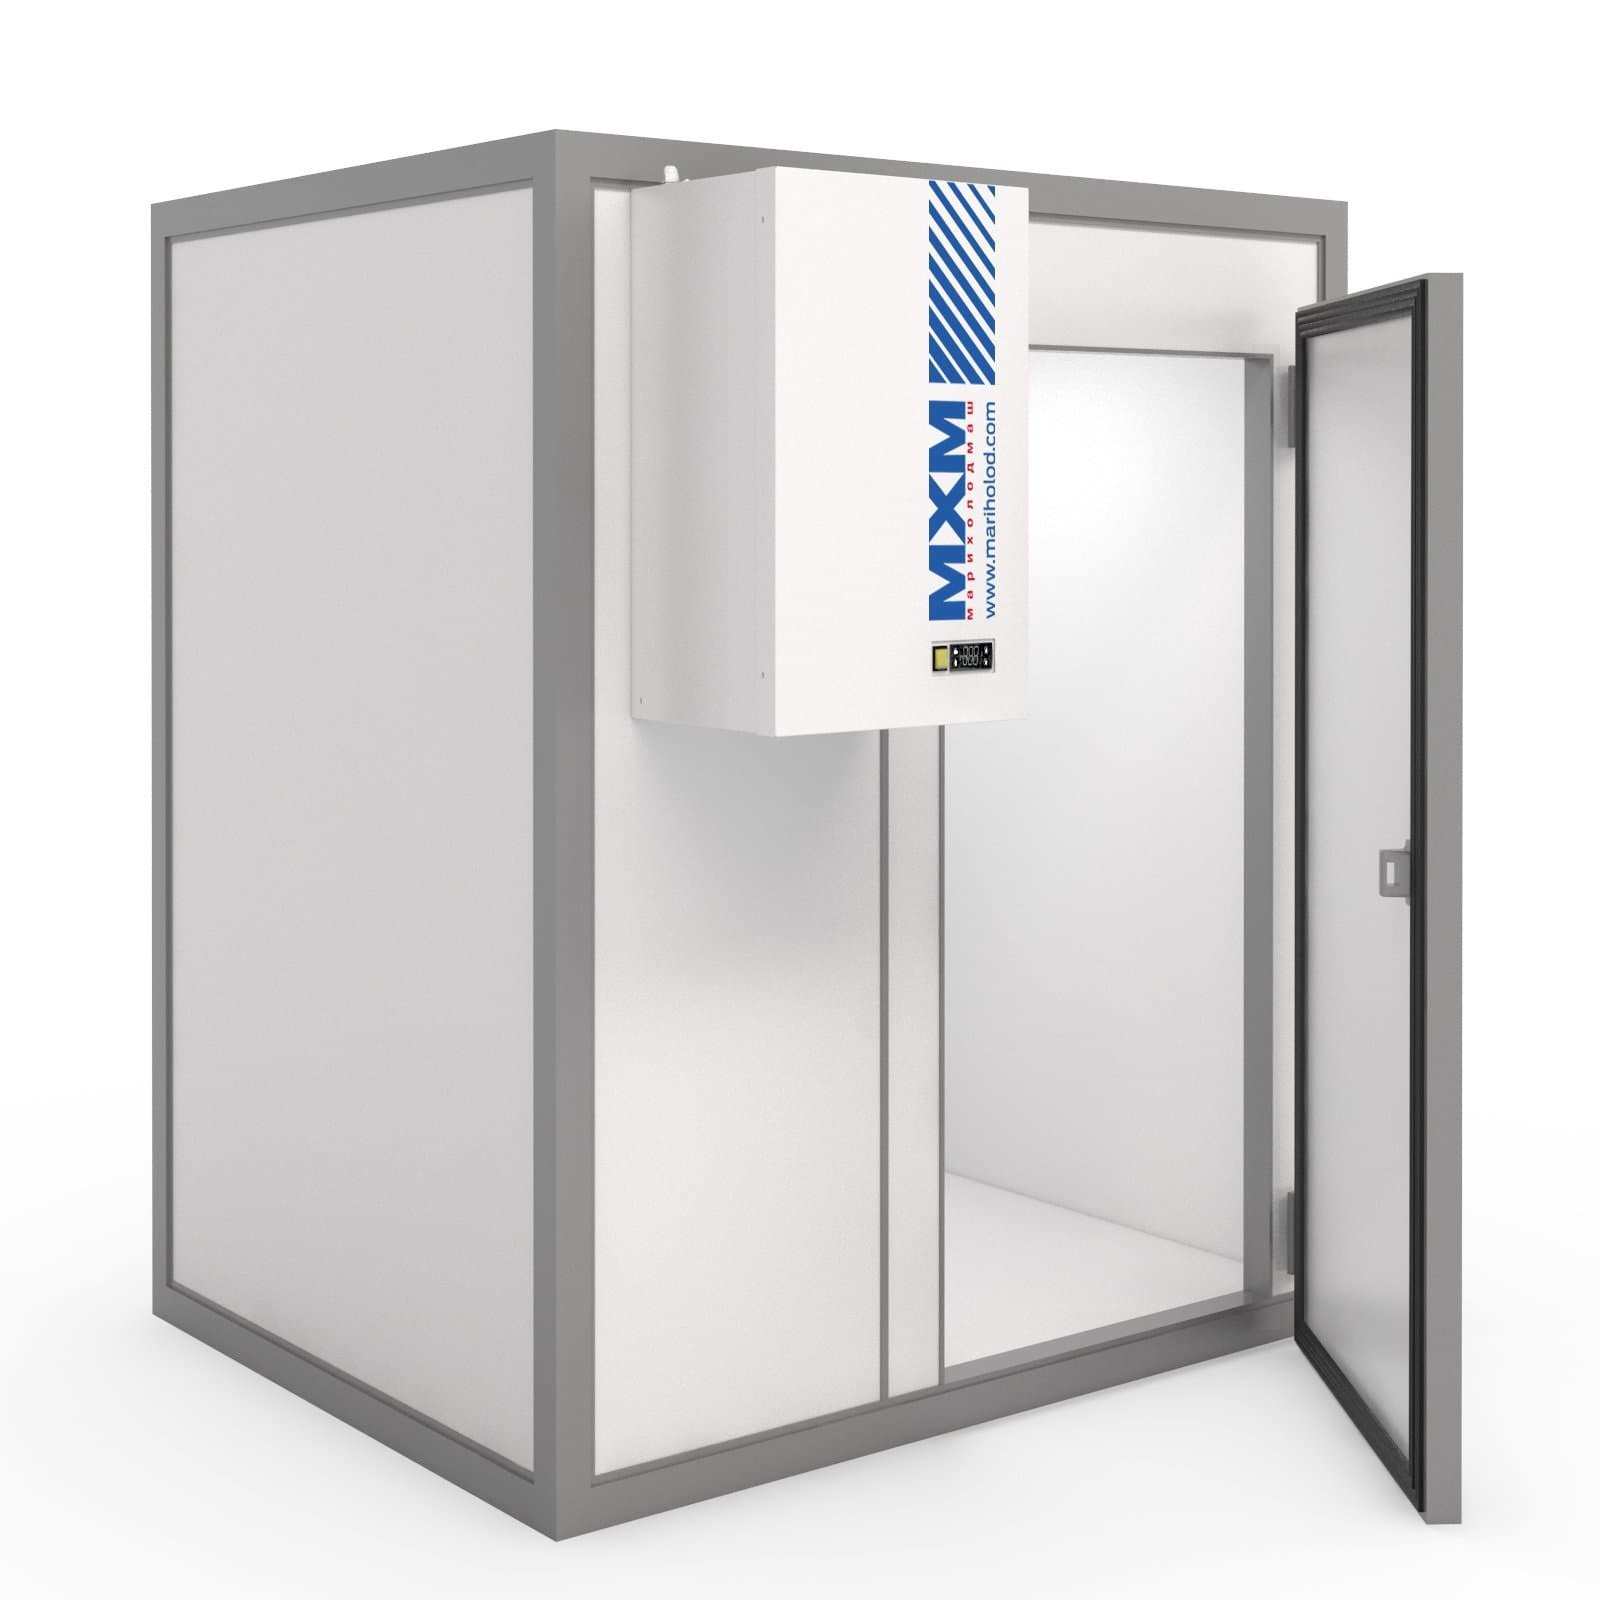 Камера холодильная МХМ КХН-43,47 2260×9160×2460